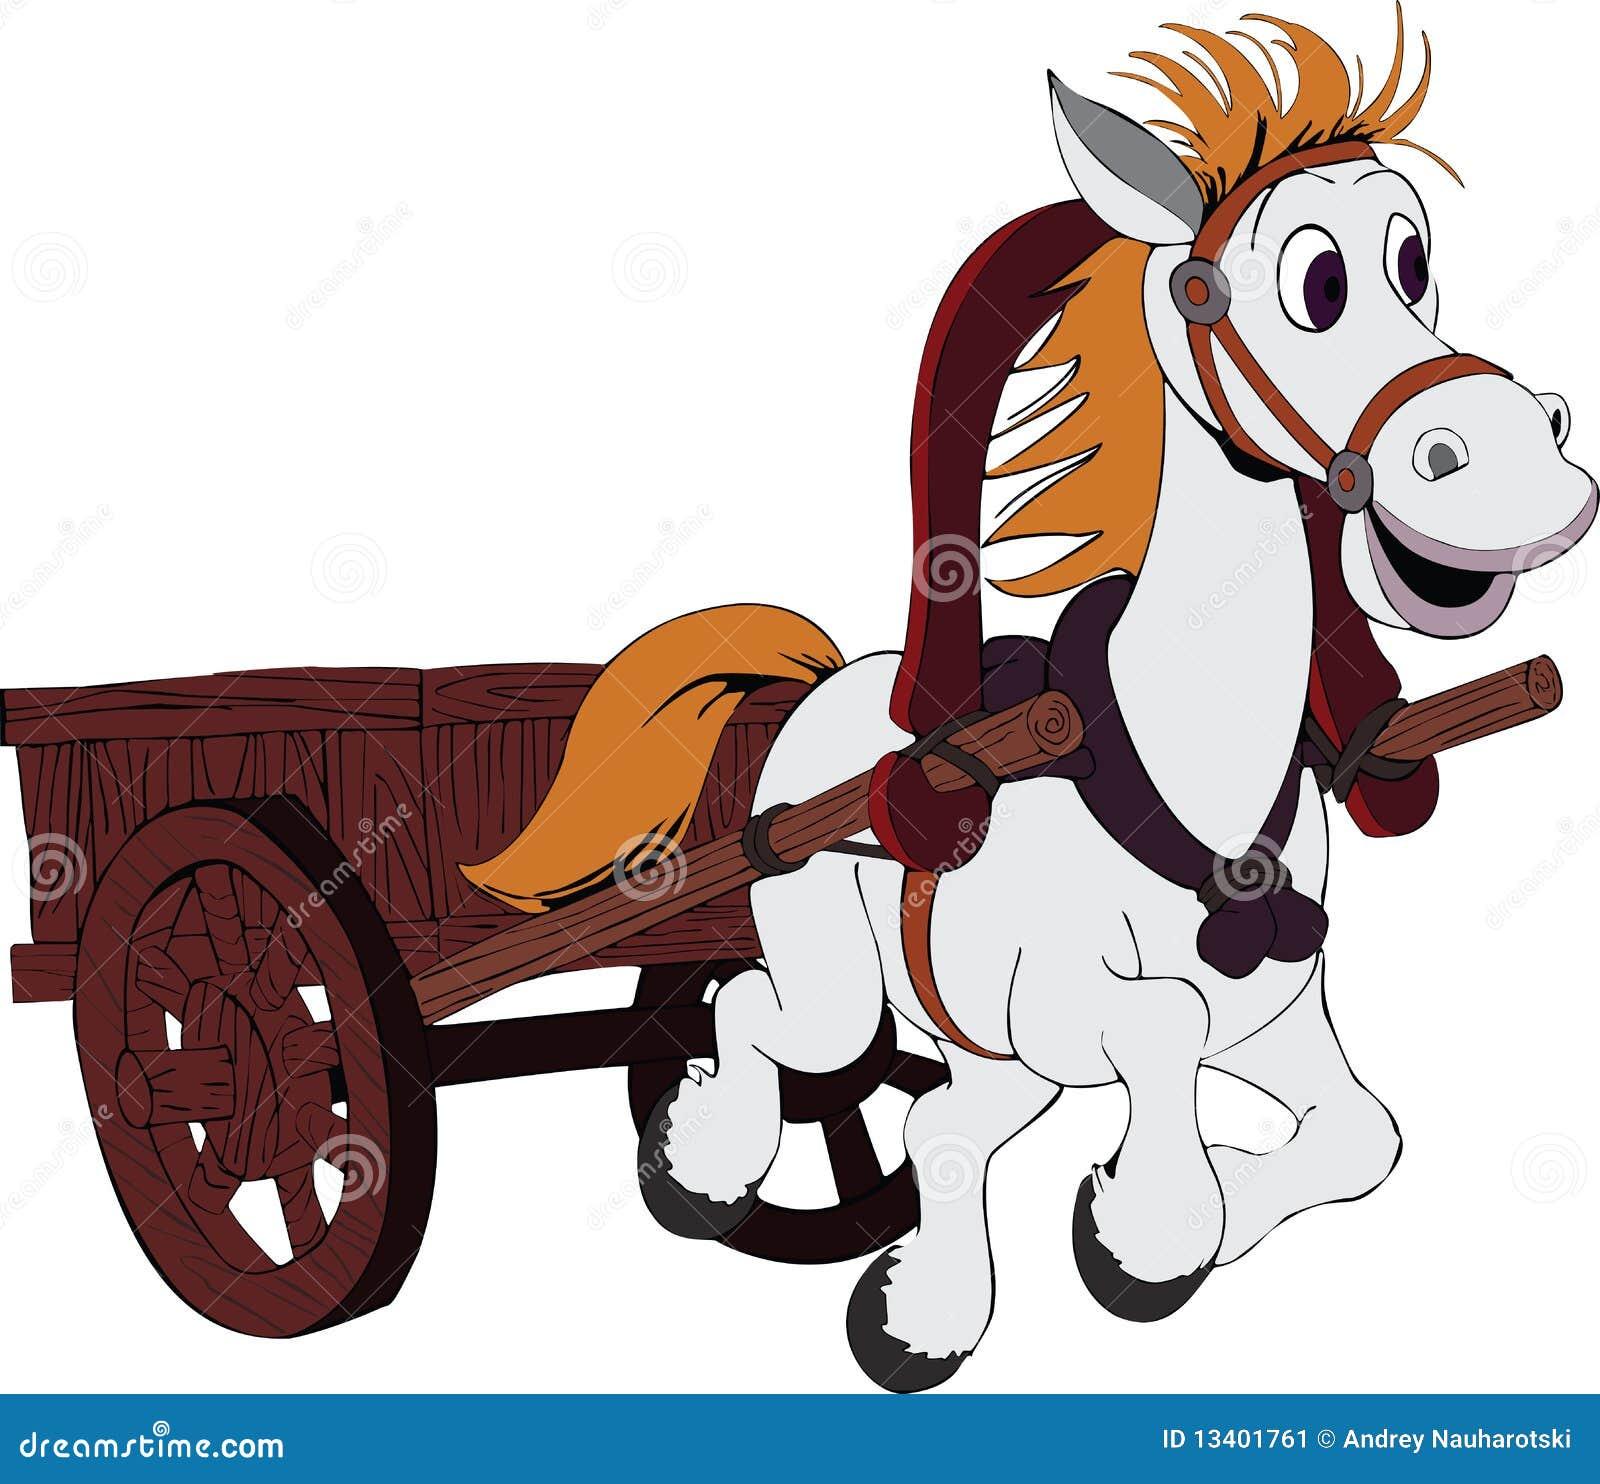 Рисунки лошадей с повозками